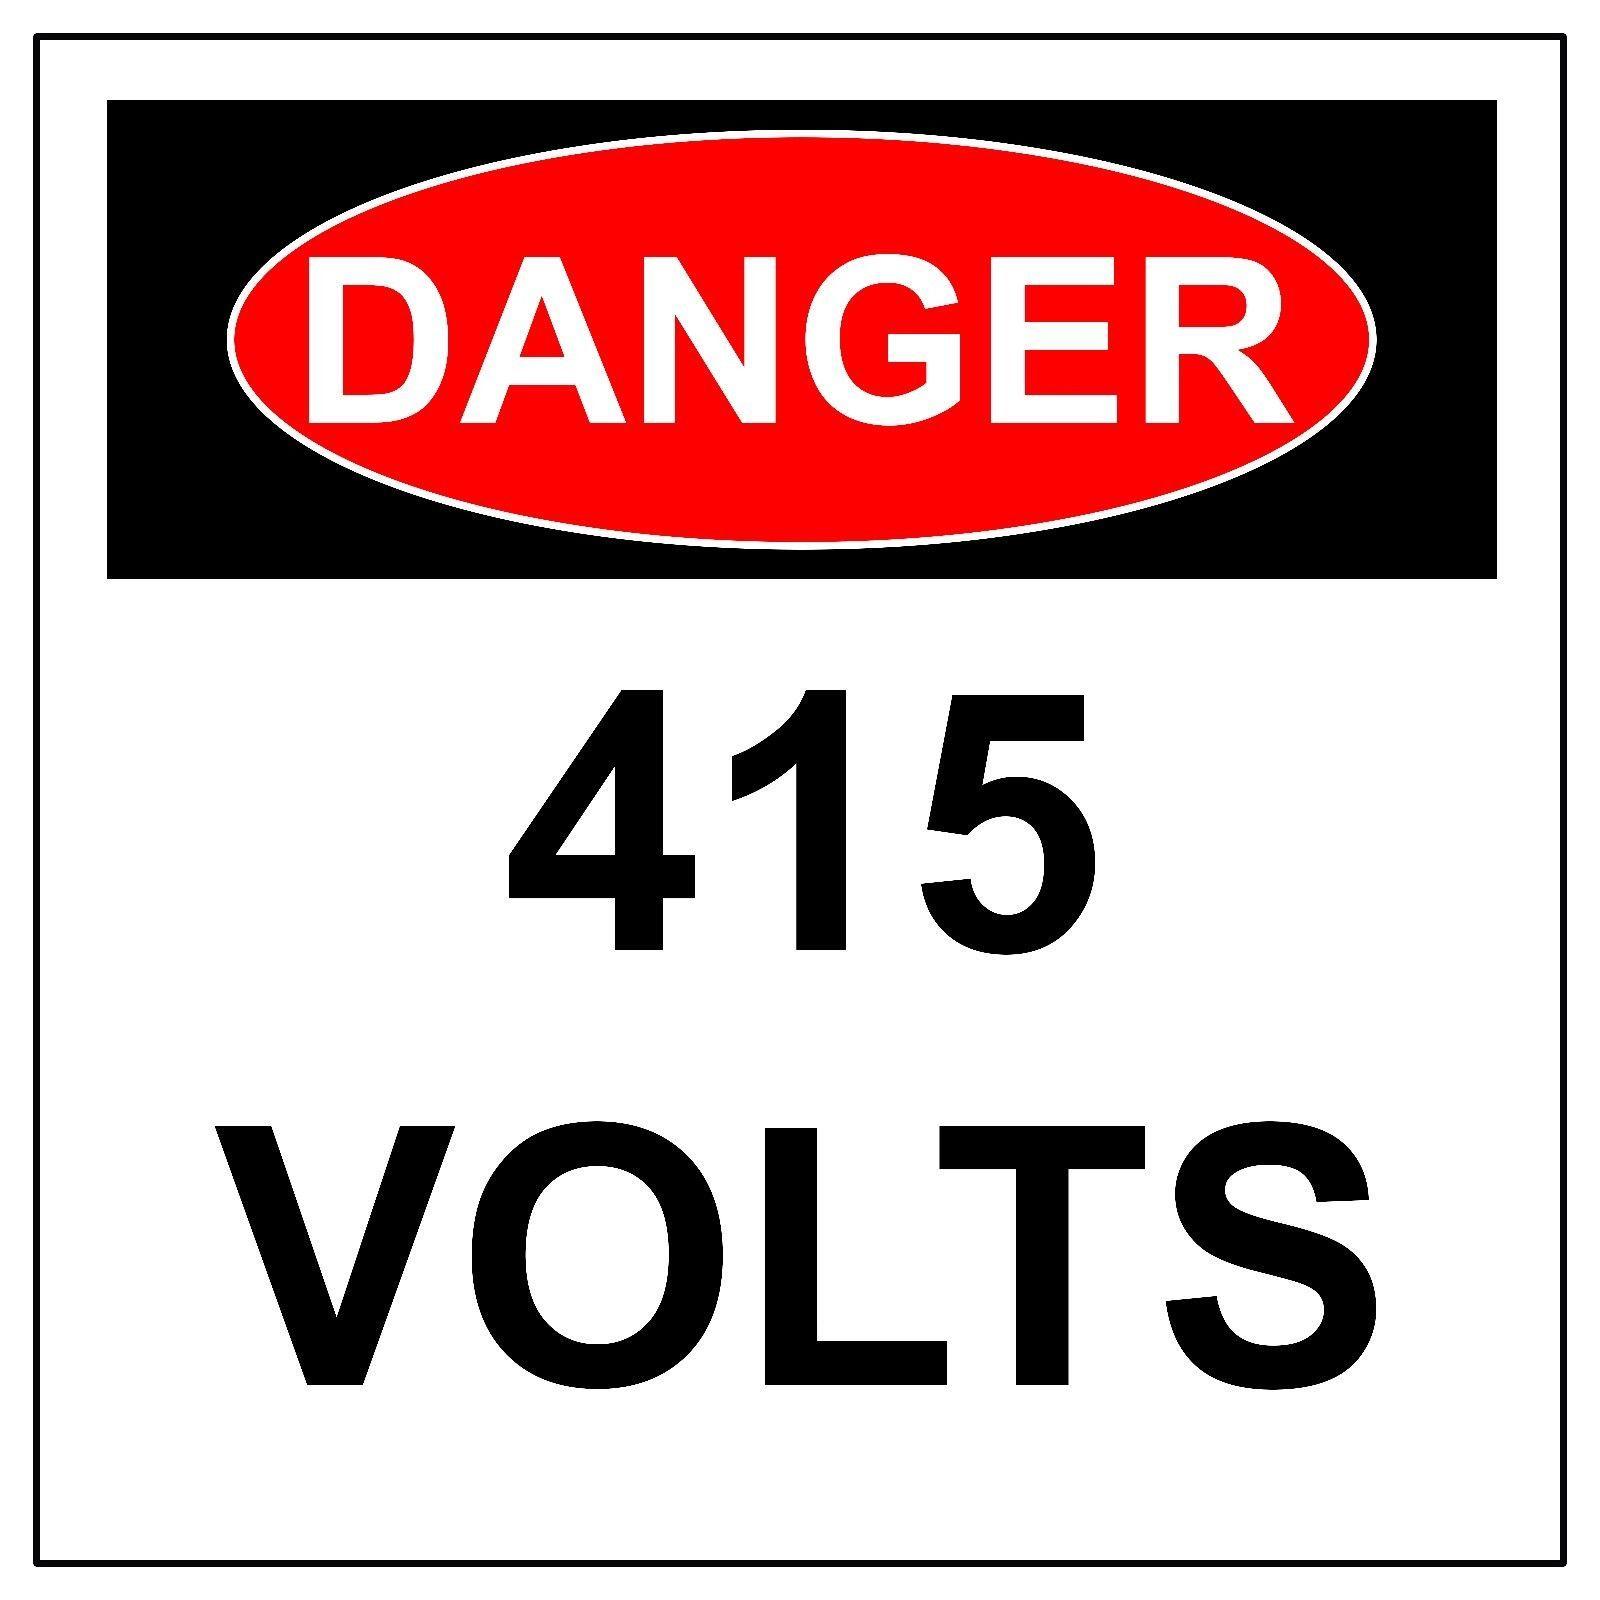 Danger 415 Volts Electrical Hazard Sign Aluminum Metal